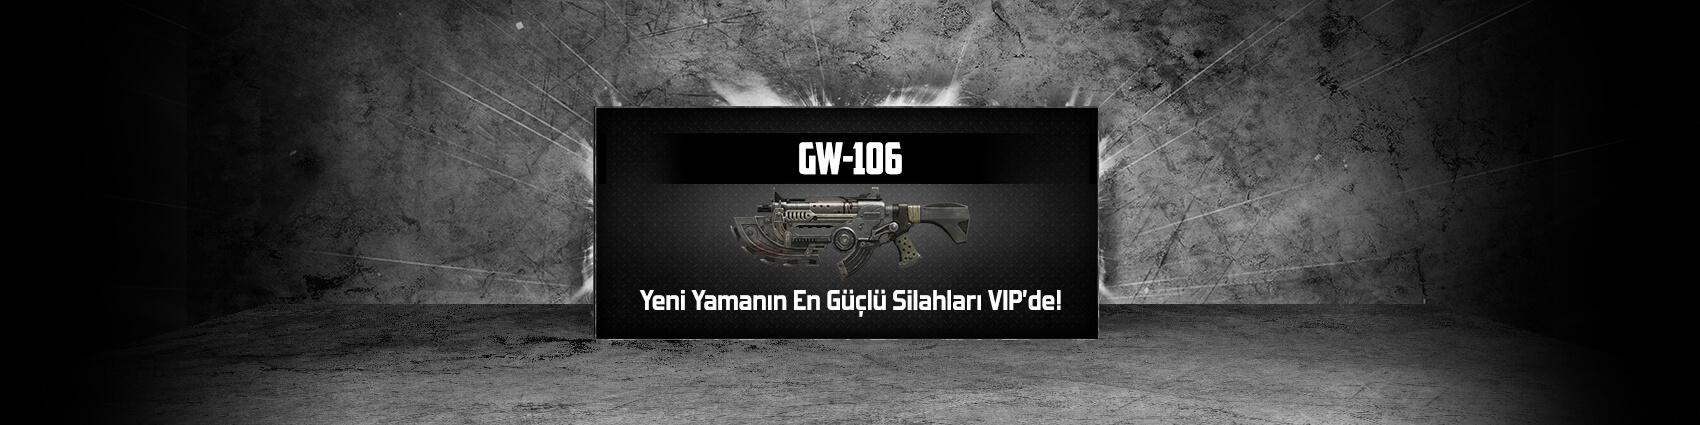 GW 106